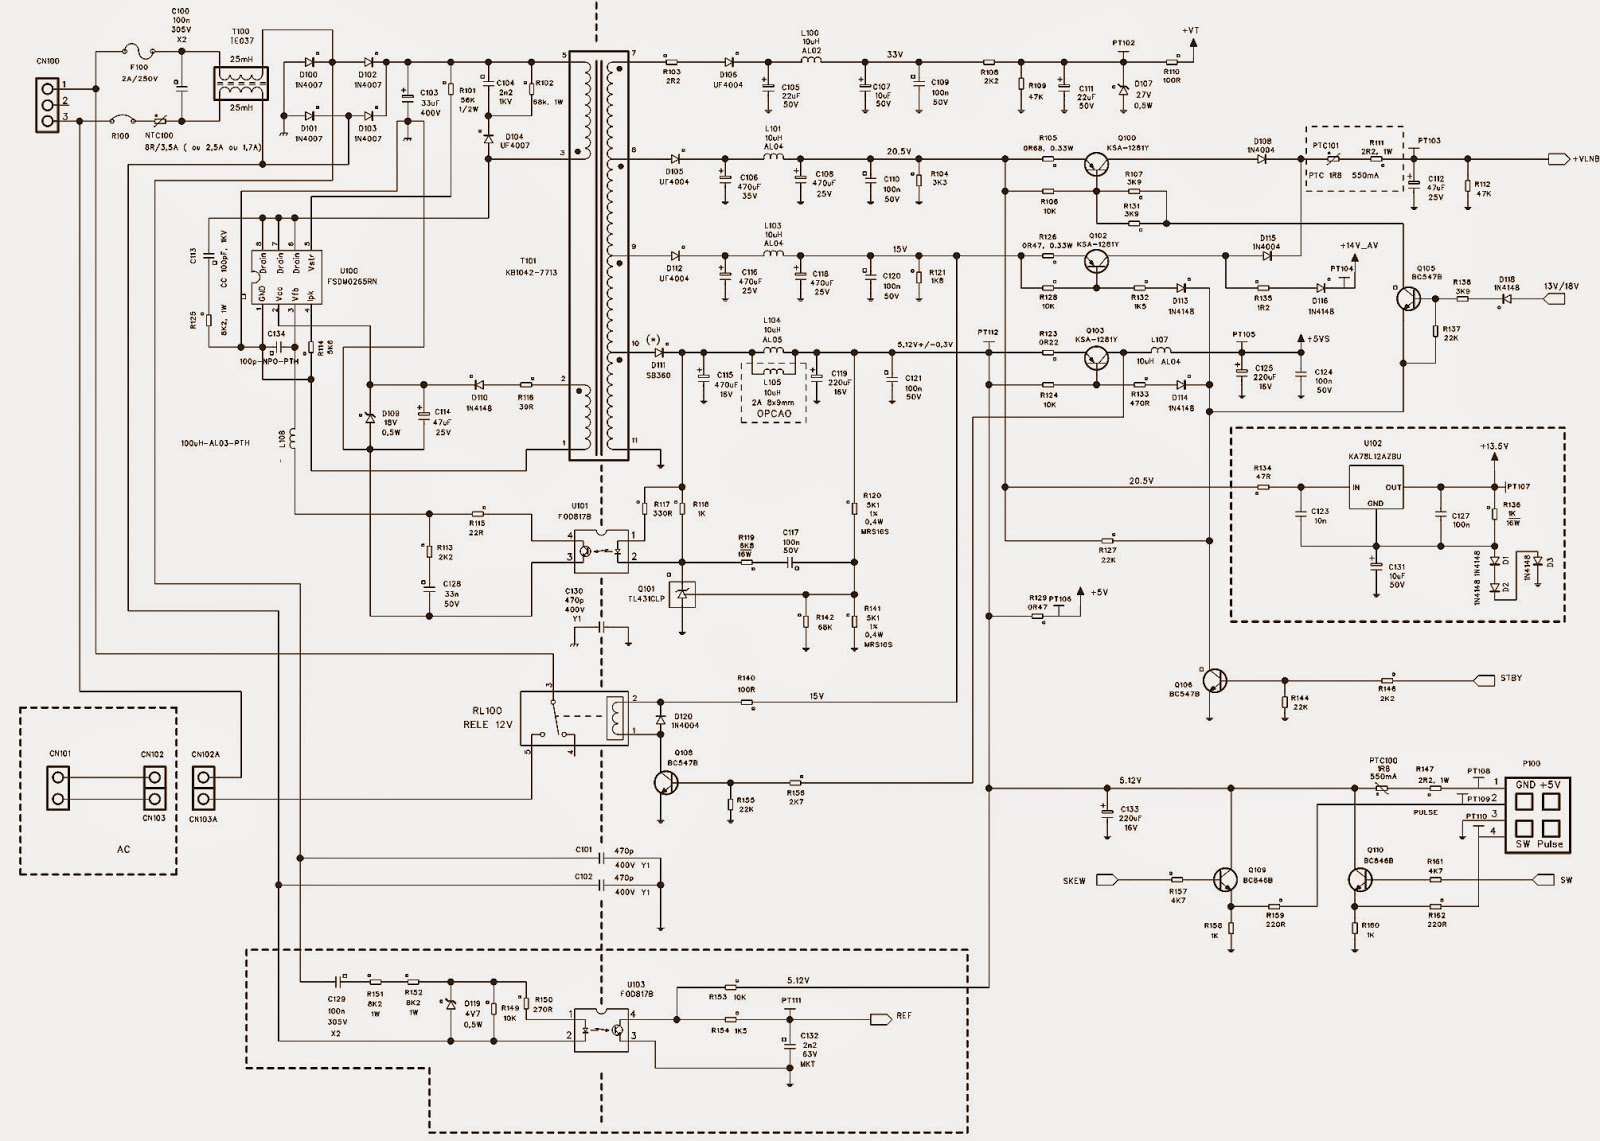 medium resolution of cisco set top box circuit diagram all kind of wiring diagrams u2022 verizon fios set